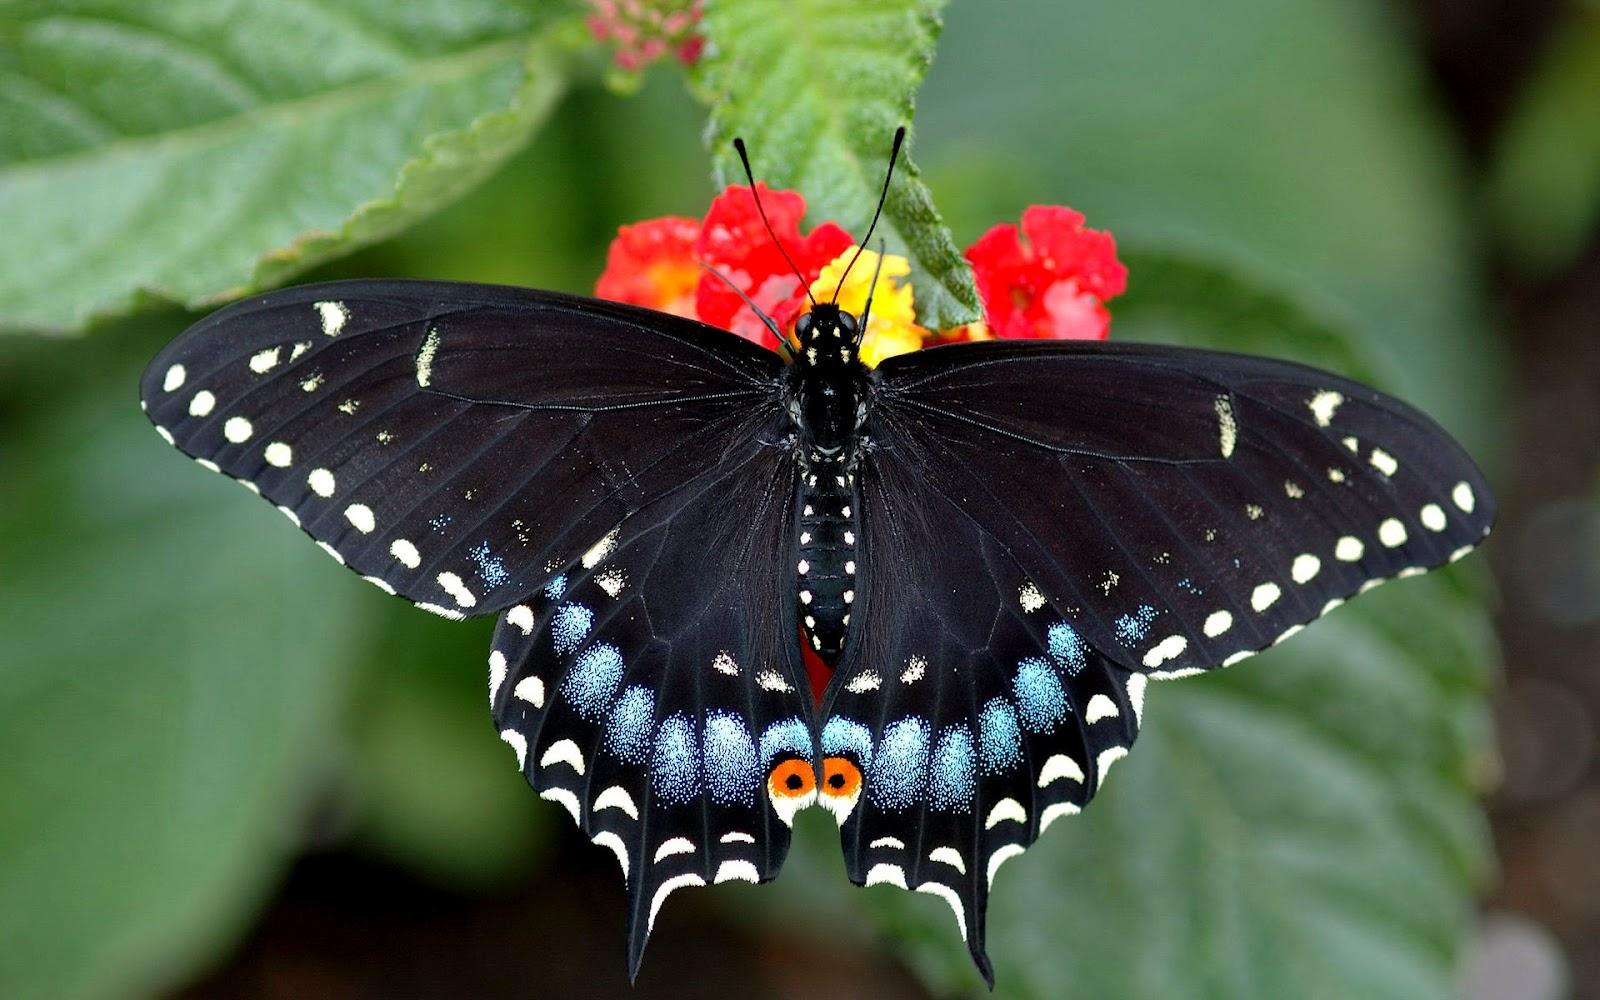 Animales Fondos De Escritorio Hd: Mariposa Cola De Golondrina